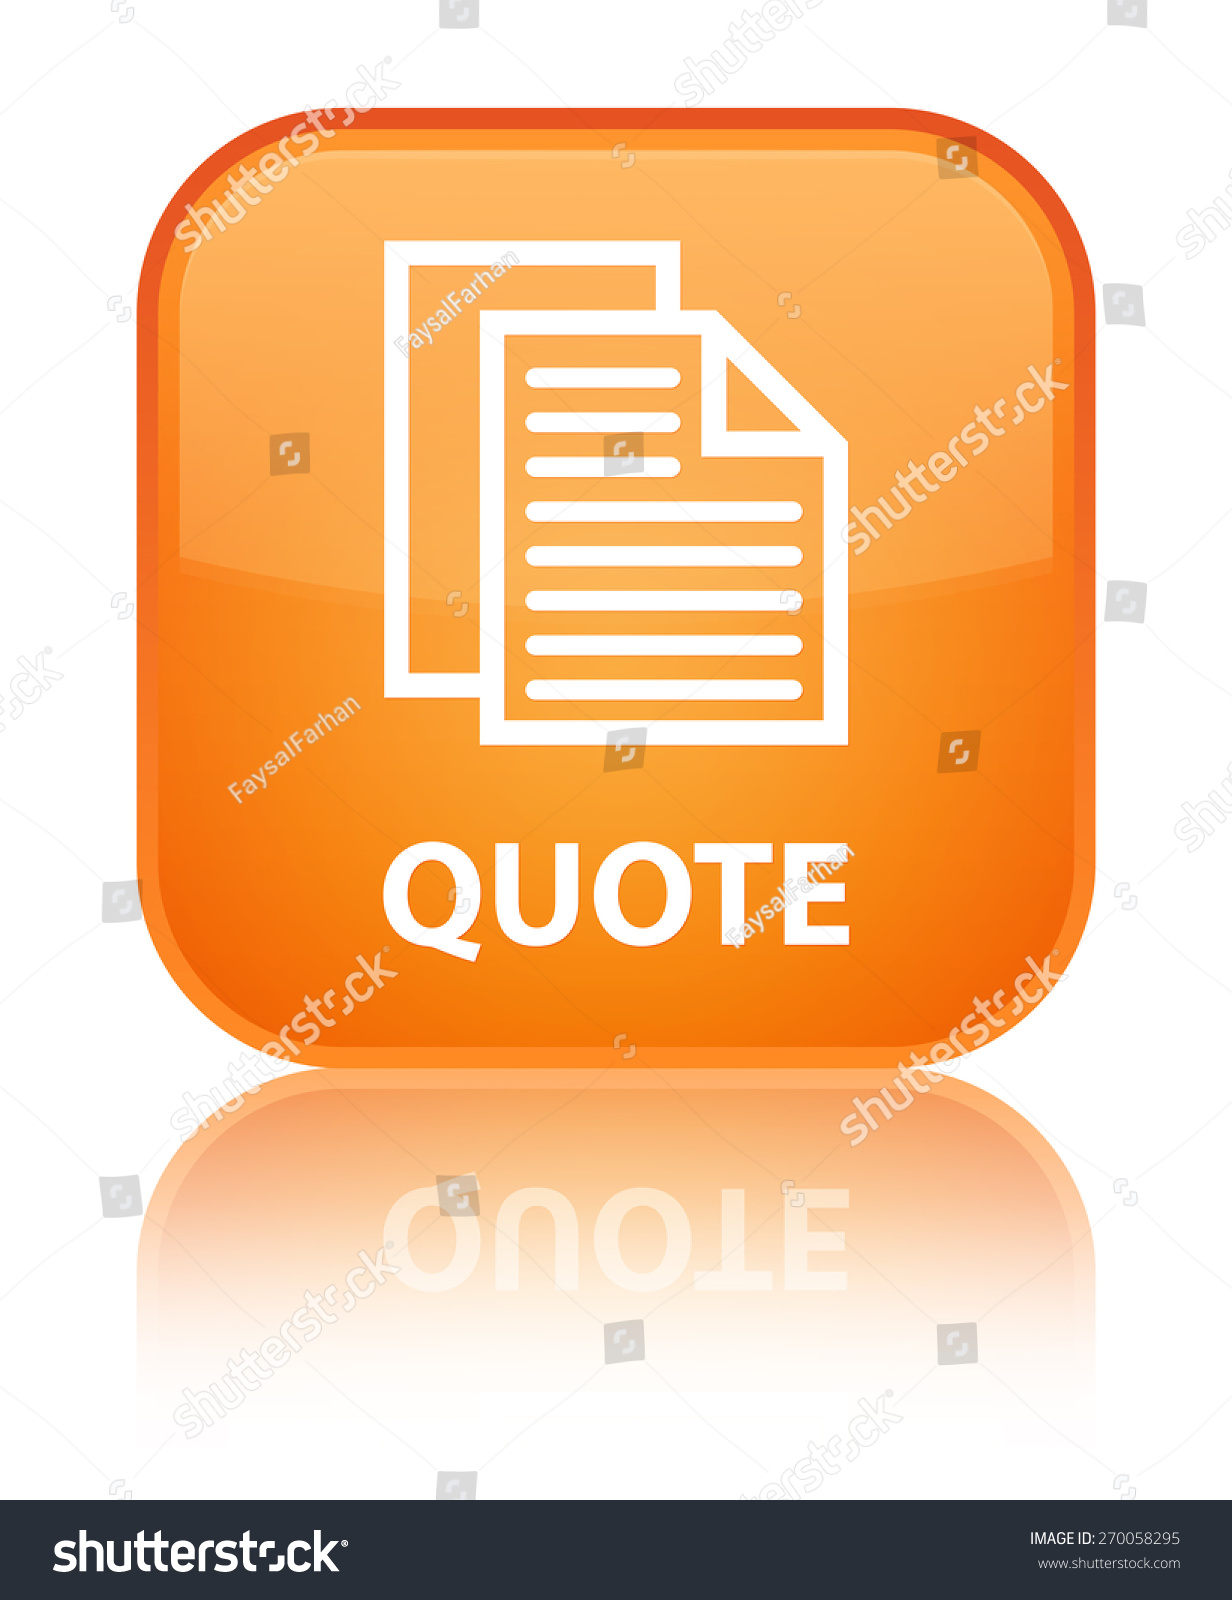 quote document pages icon orange square stock illustration quote document pages icon orange square button